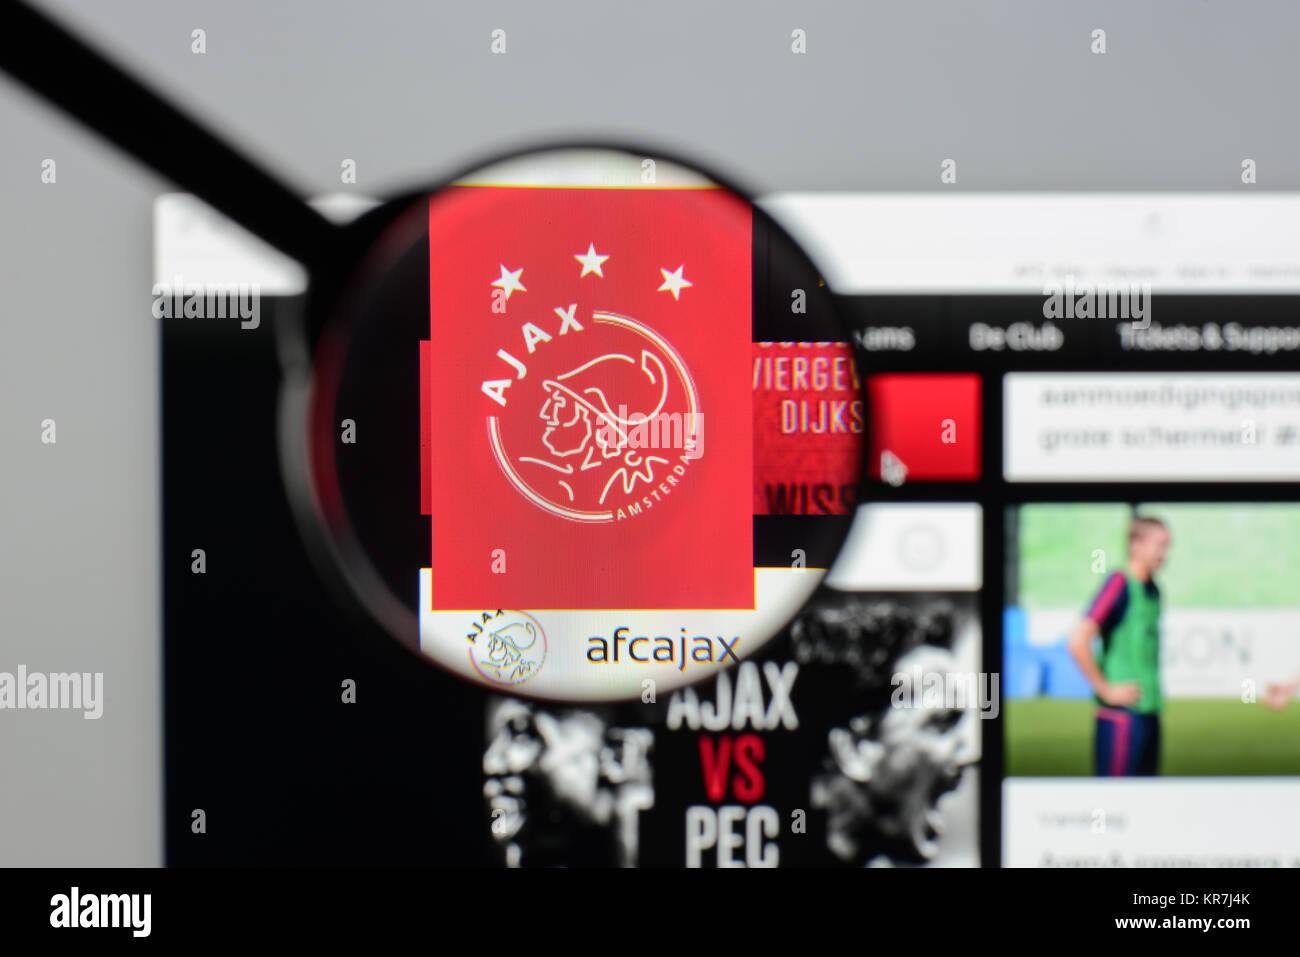 ajax amsterdam homepage